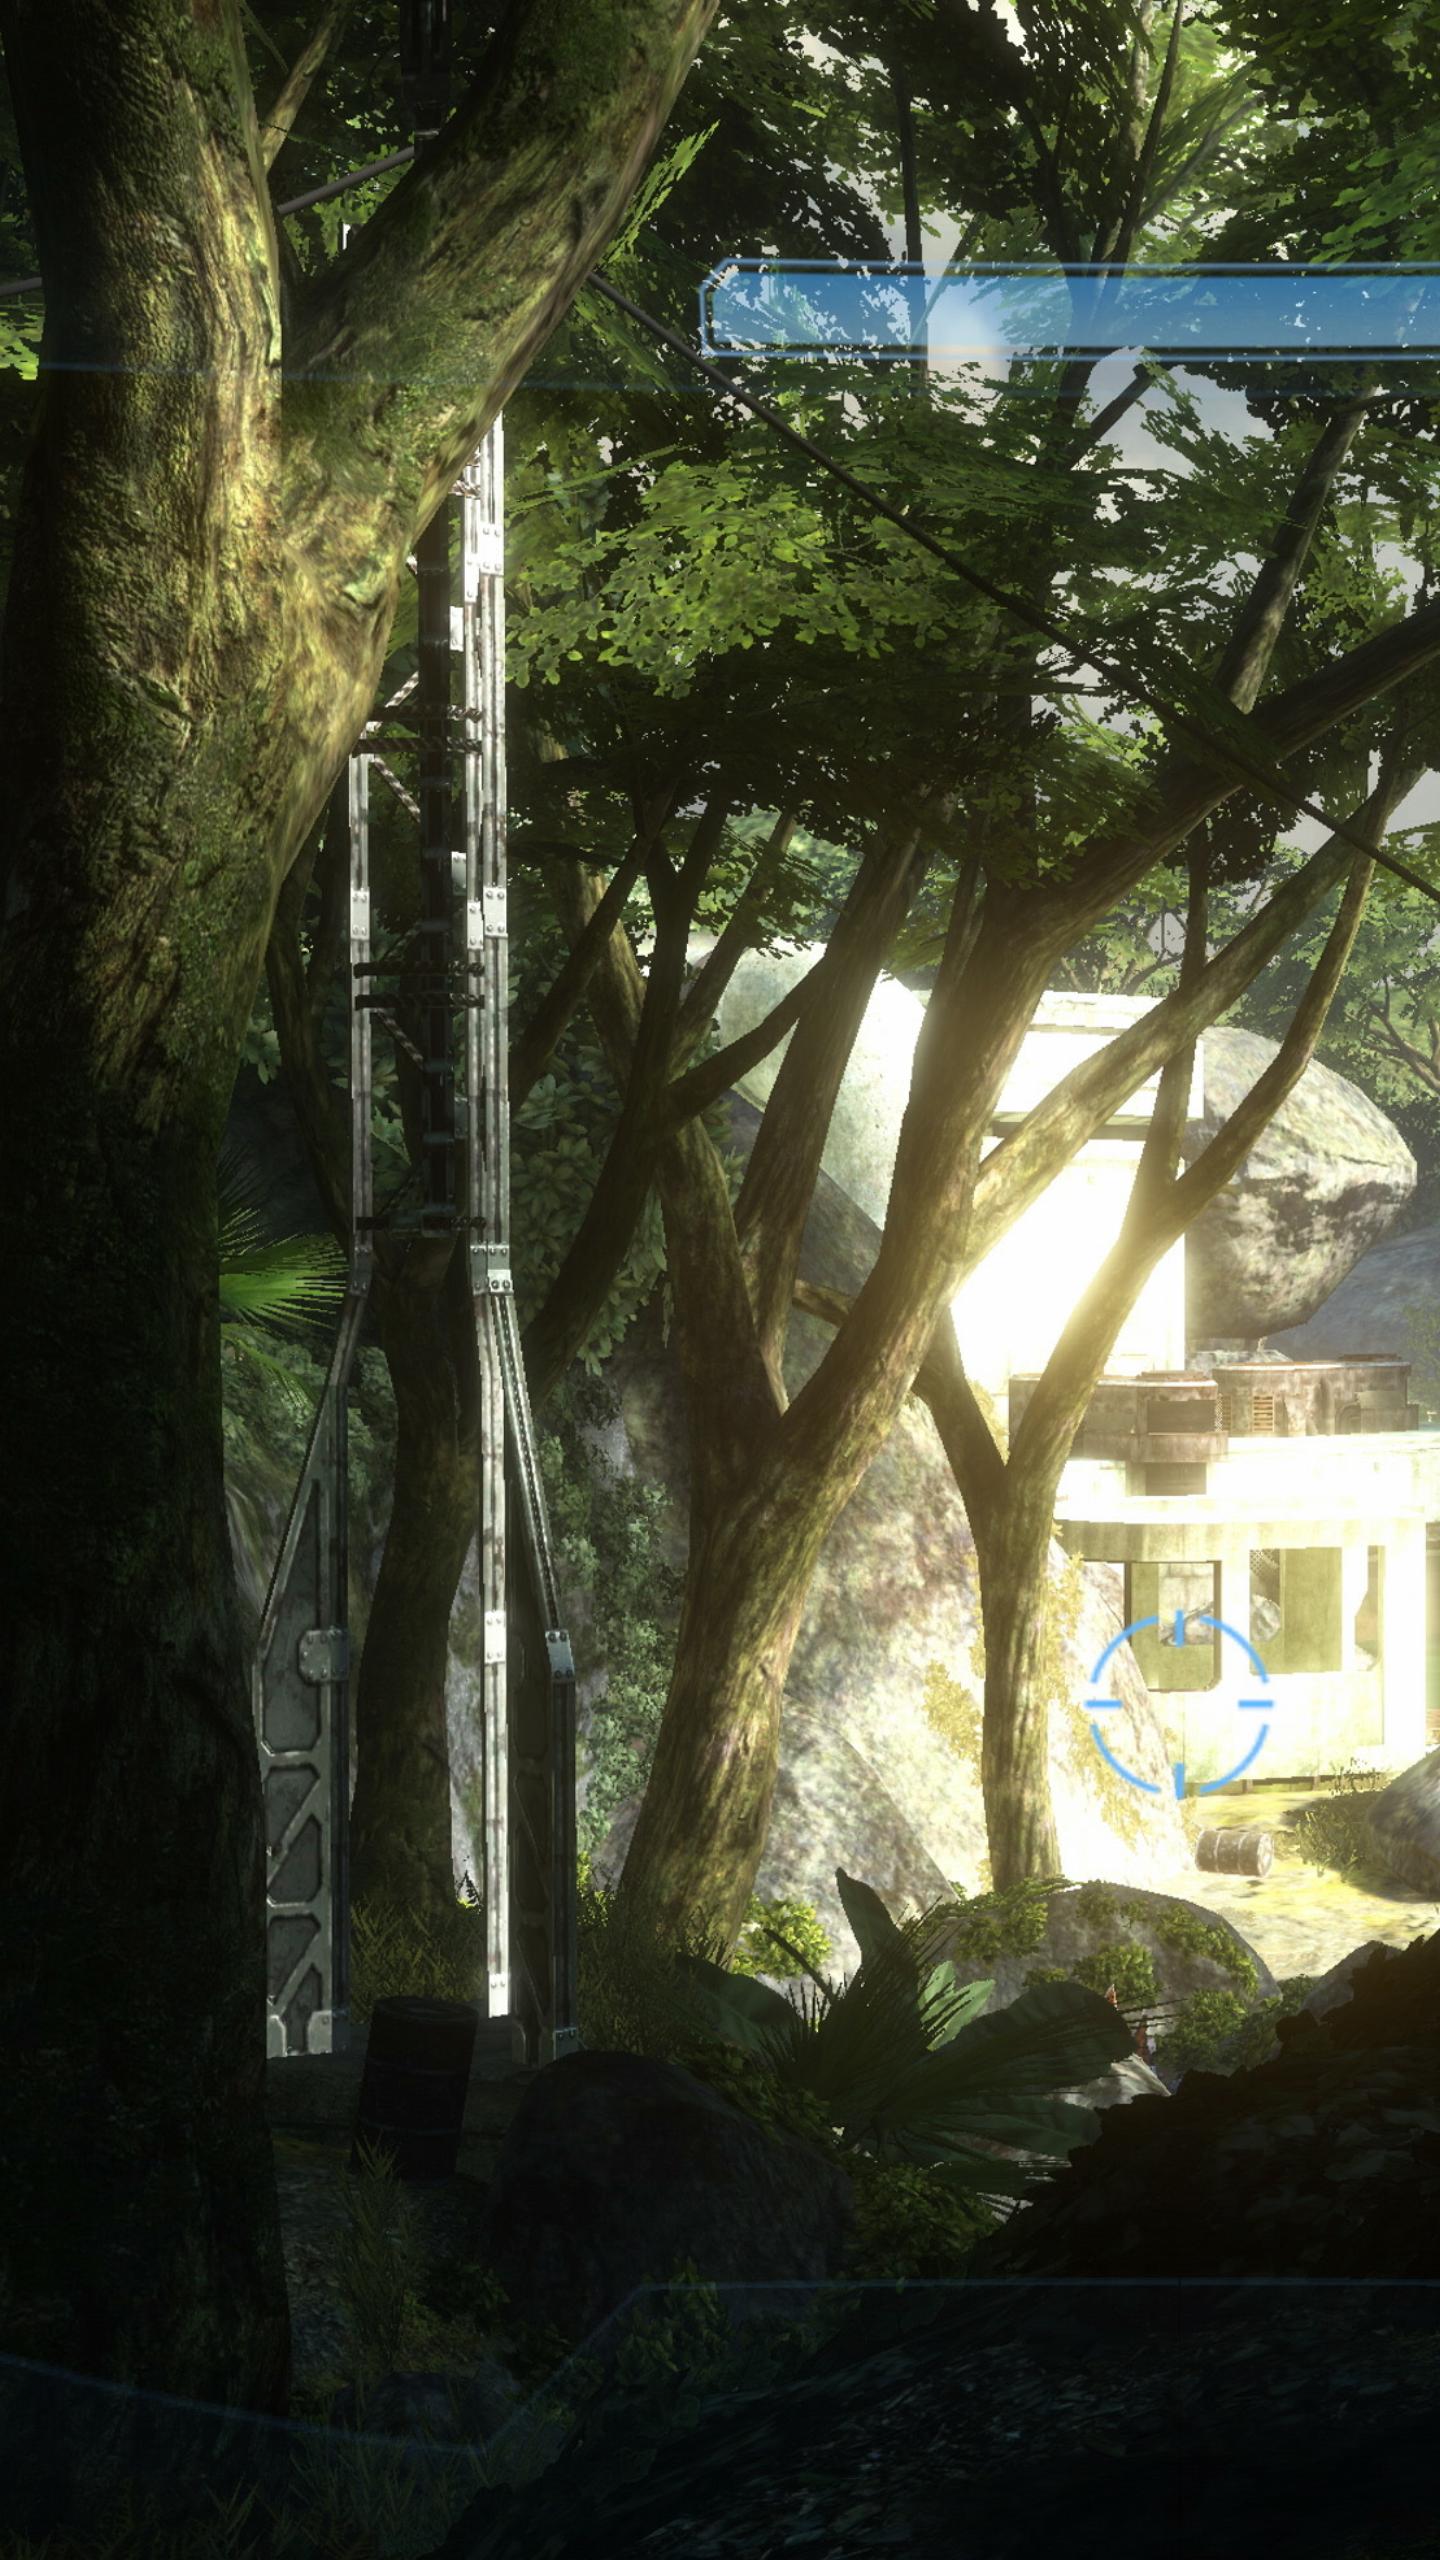 hwmrqzZp7TyWZ - 【朗報】XboxOneXの360互換機能、ガチですごい。互換すら無いProさん…